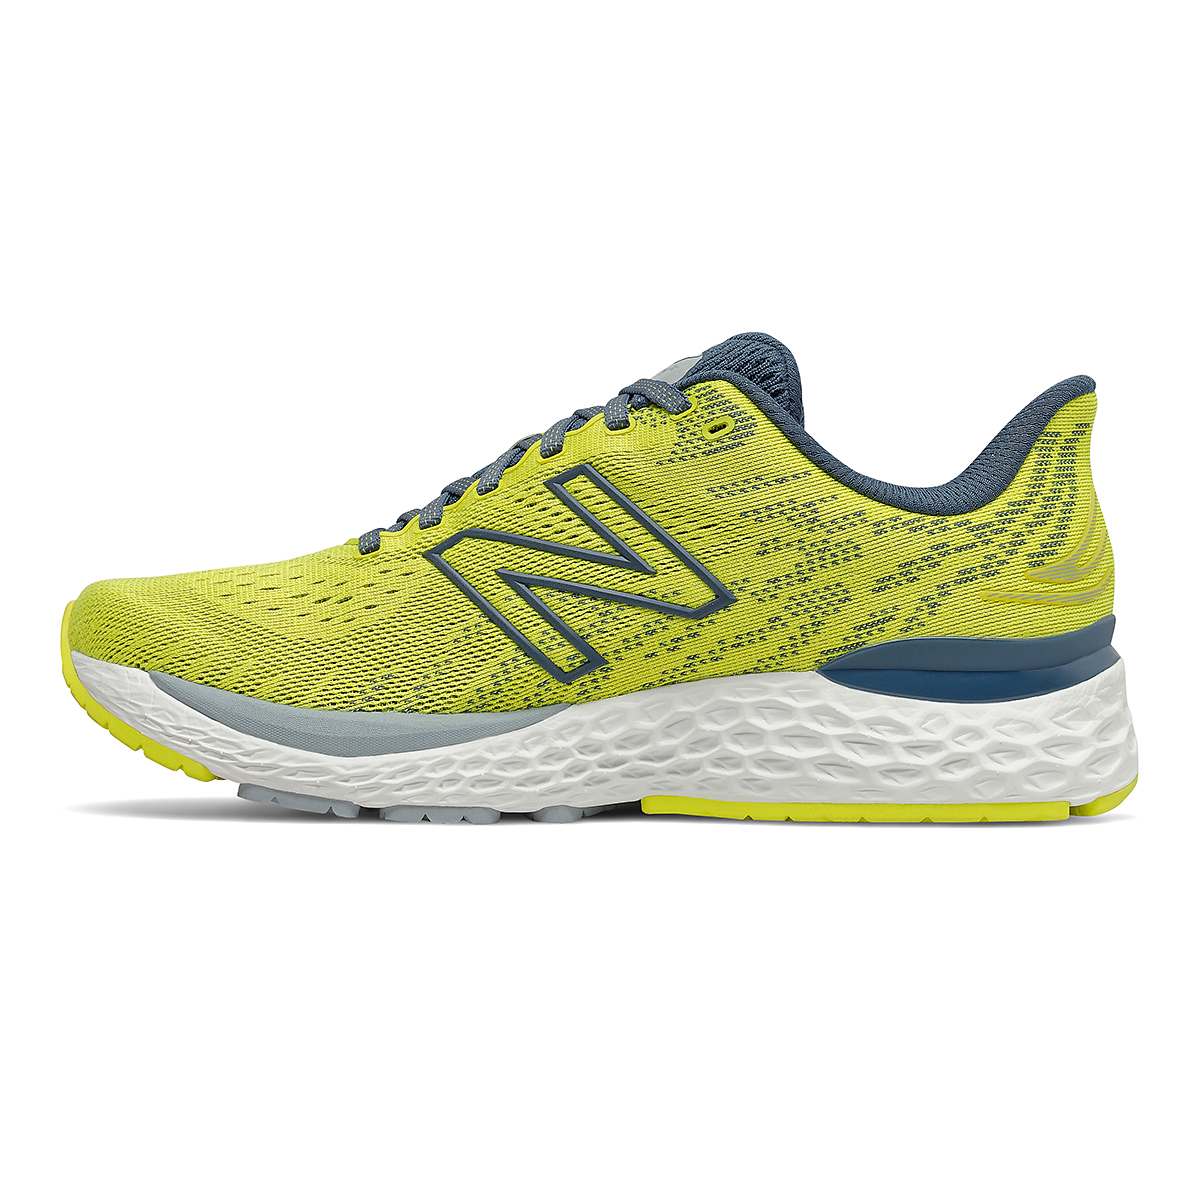 Men's New Balance Fresh Foam 880v11 Running Shoe - Color: Sulphur Yellow/Deep Ocean Grey - Size: 7 - Width: Wide, Sulphur Yellow/Deep Ocean Grey, large, image 2